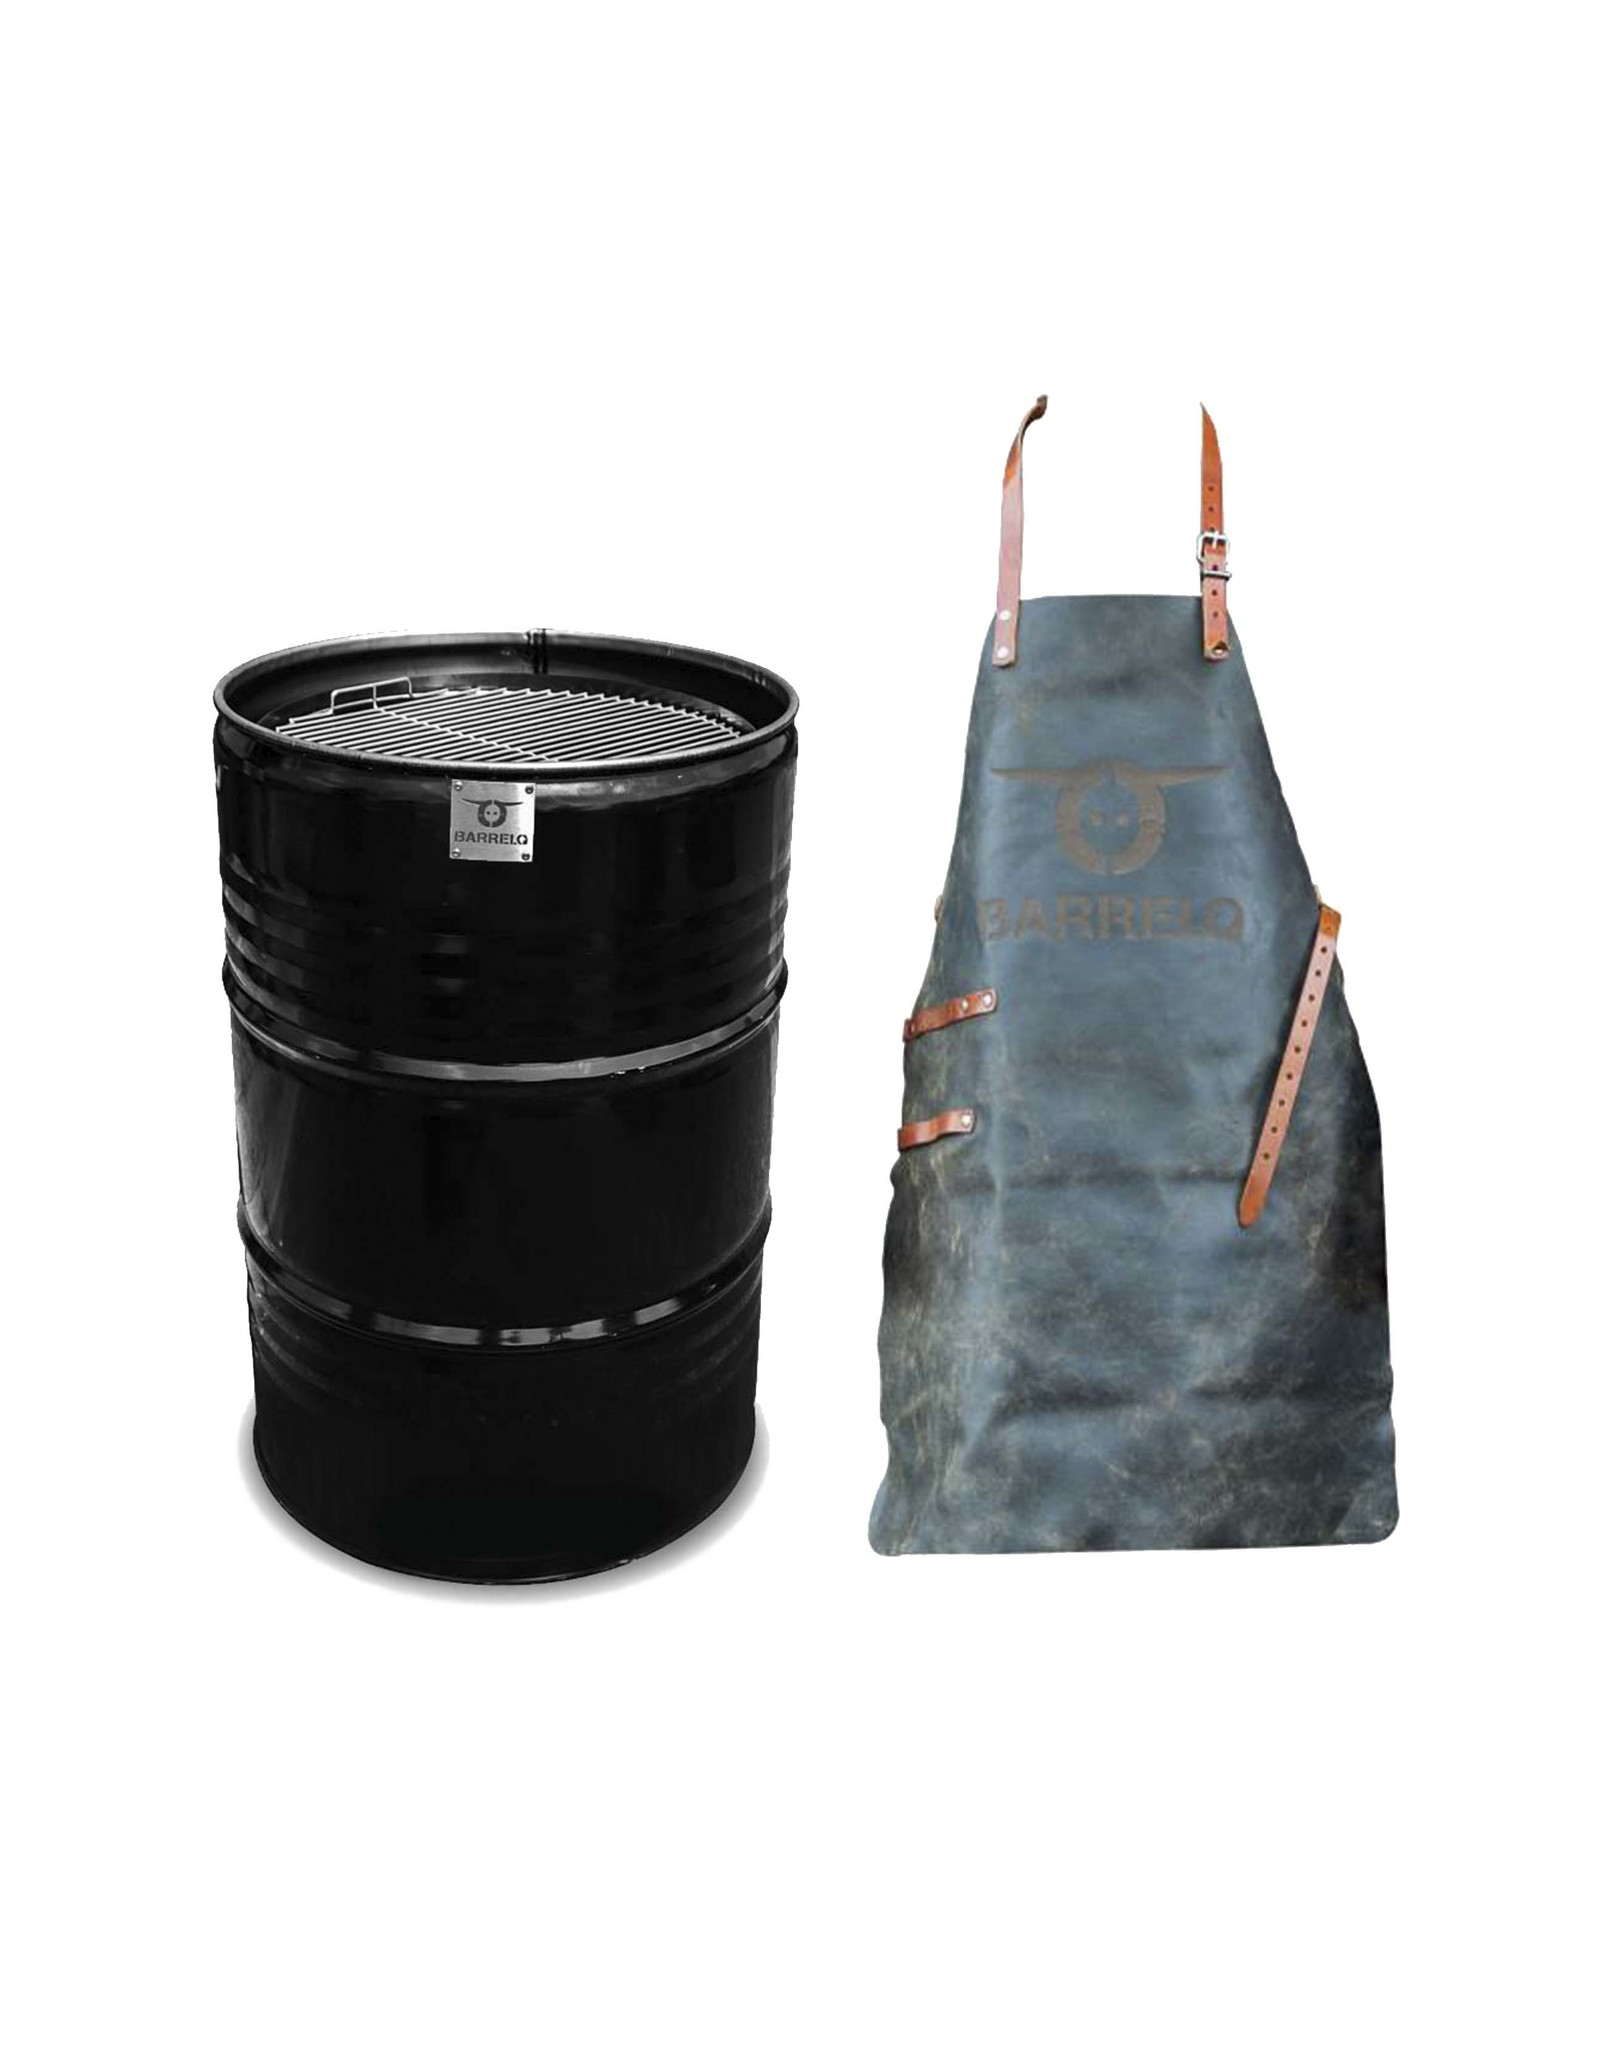 BarrelQ   BarrelQ Grill Big Original plus Grillschürze